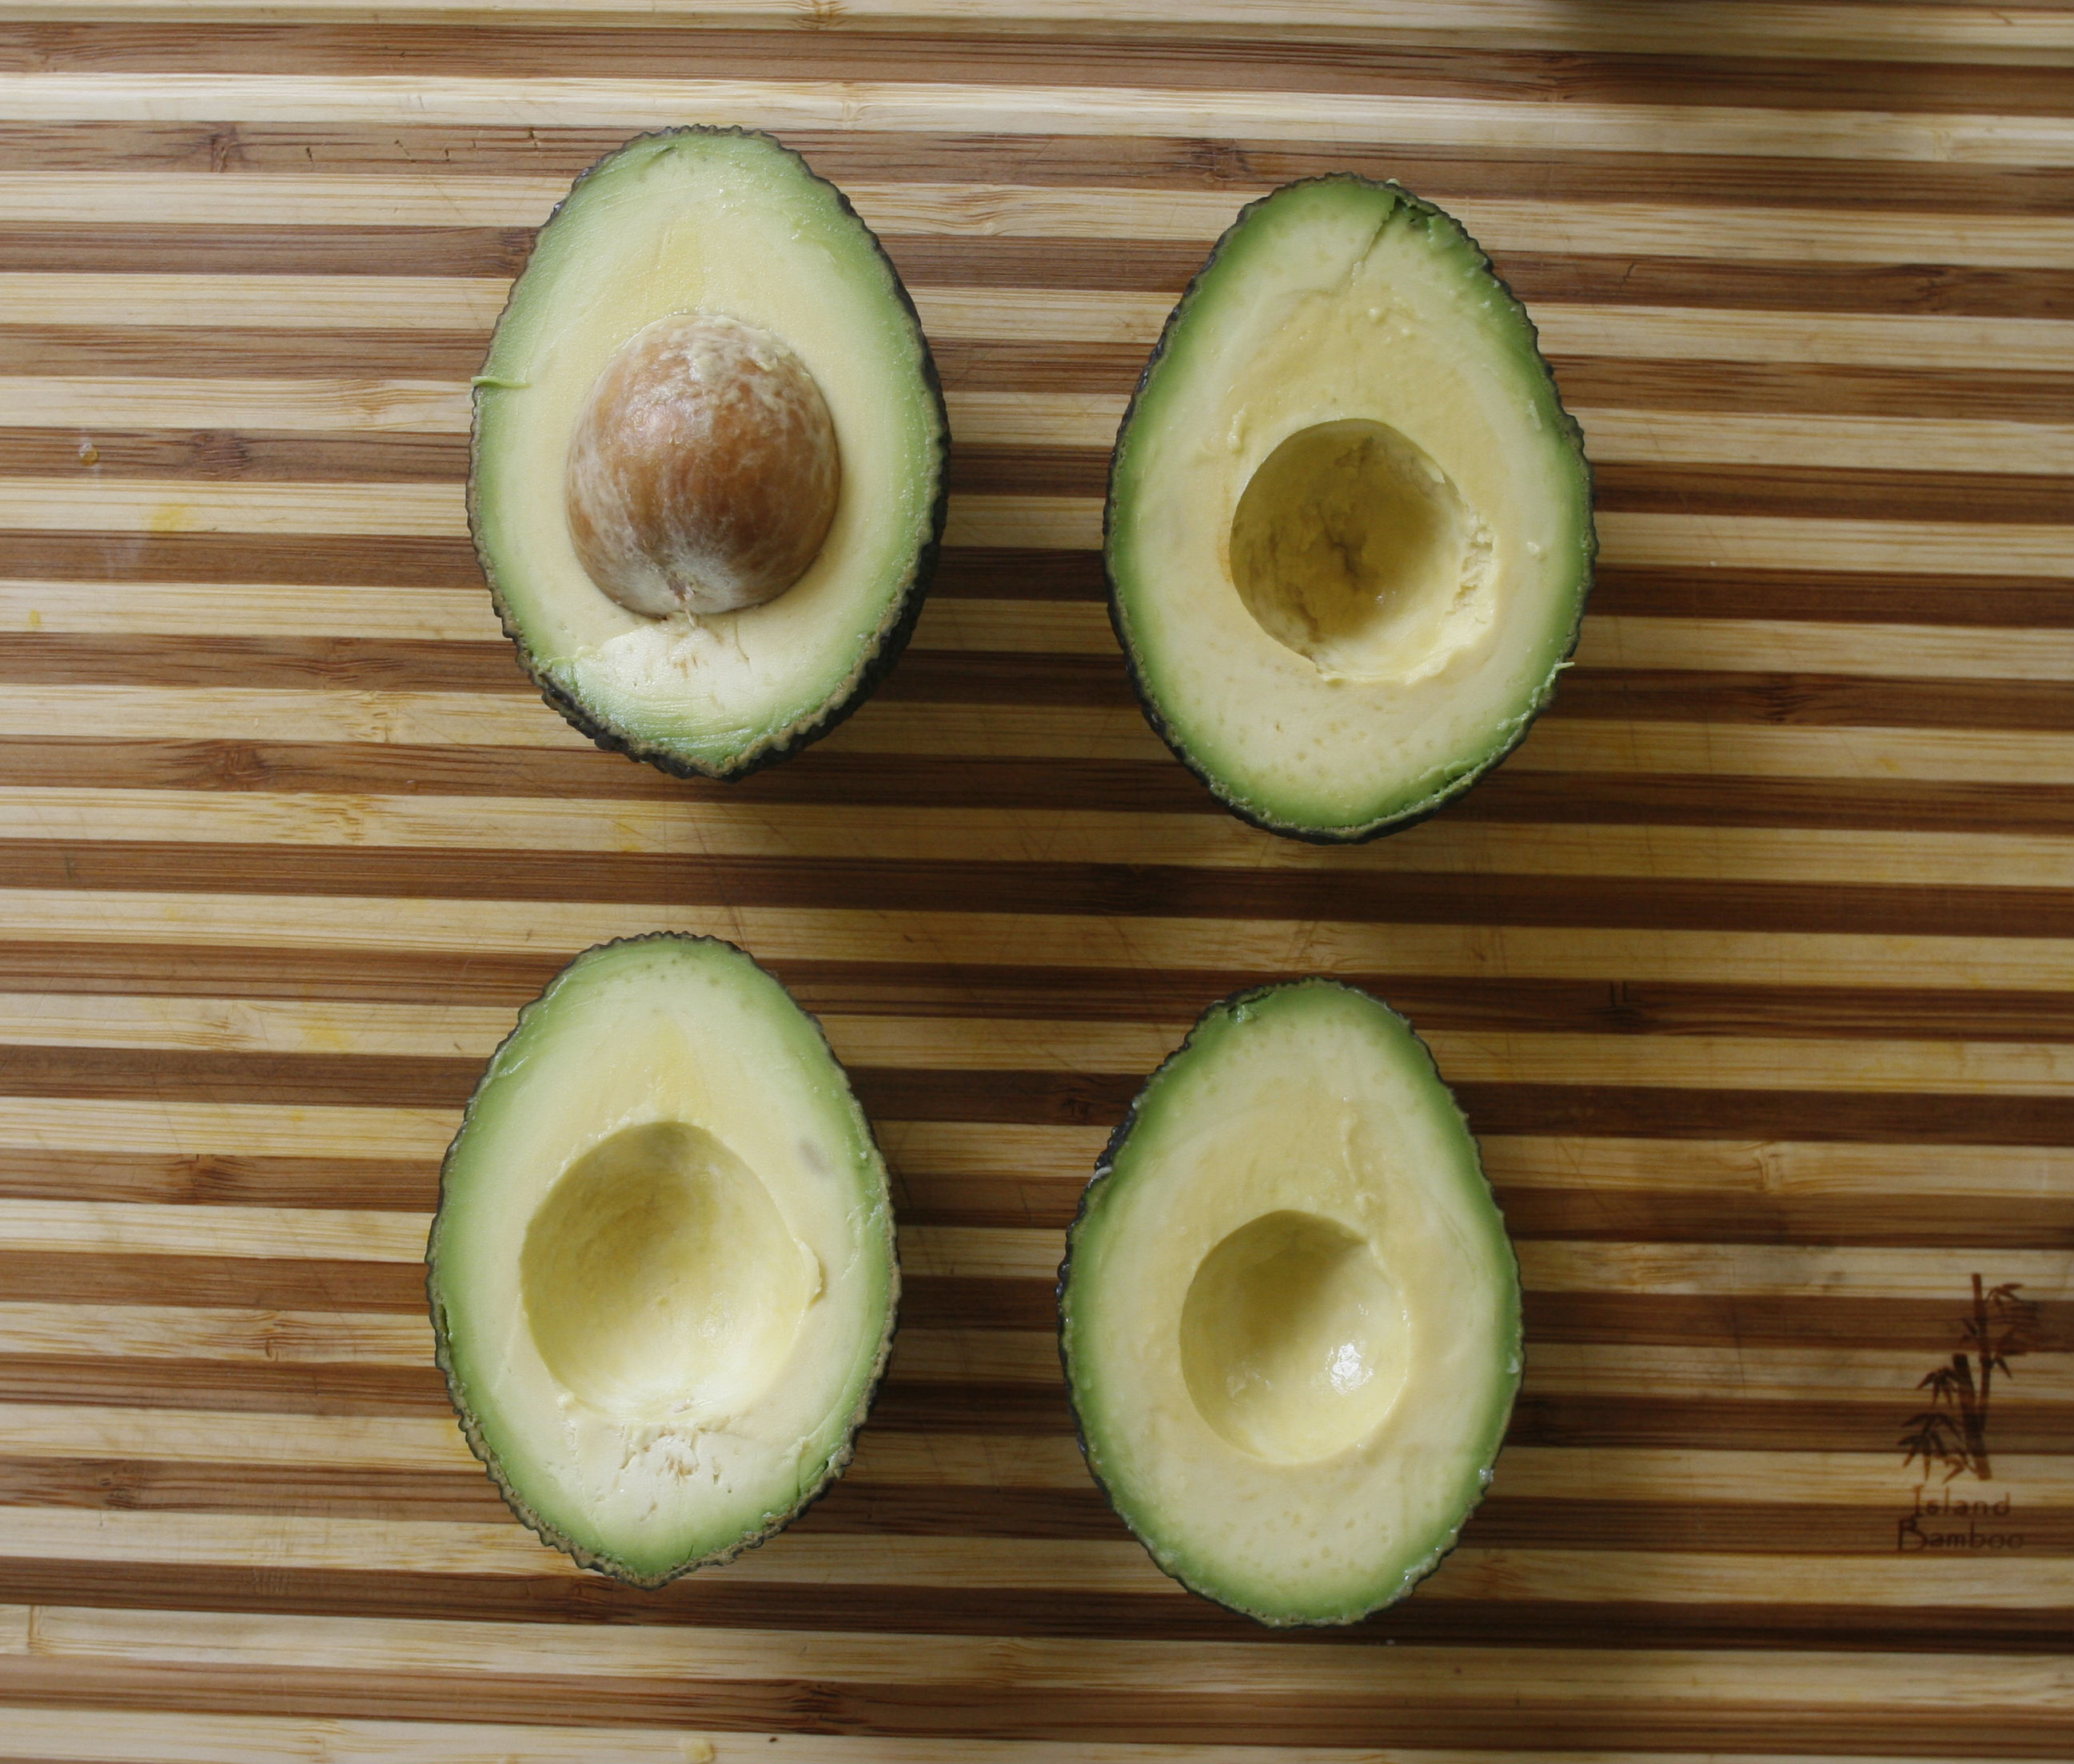 2014-08-14-avocado1.jpg